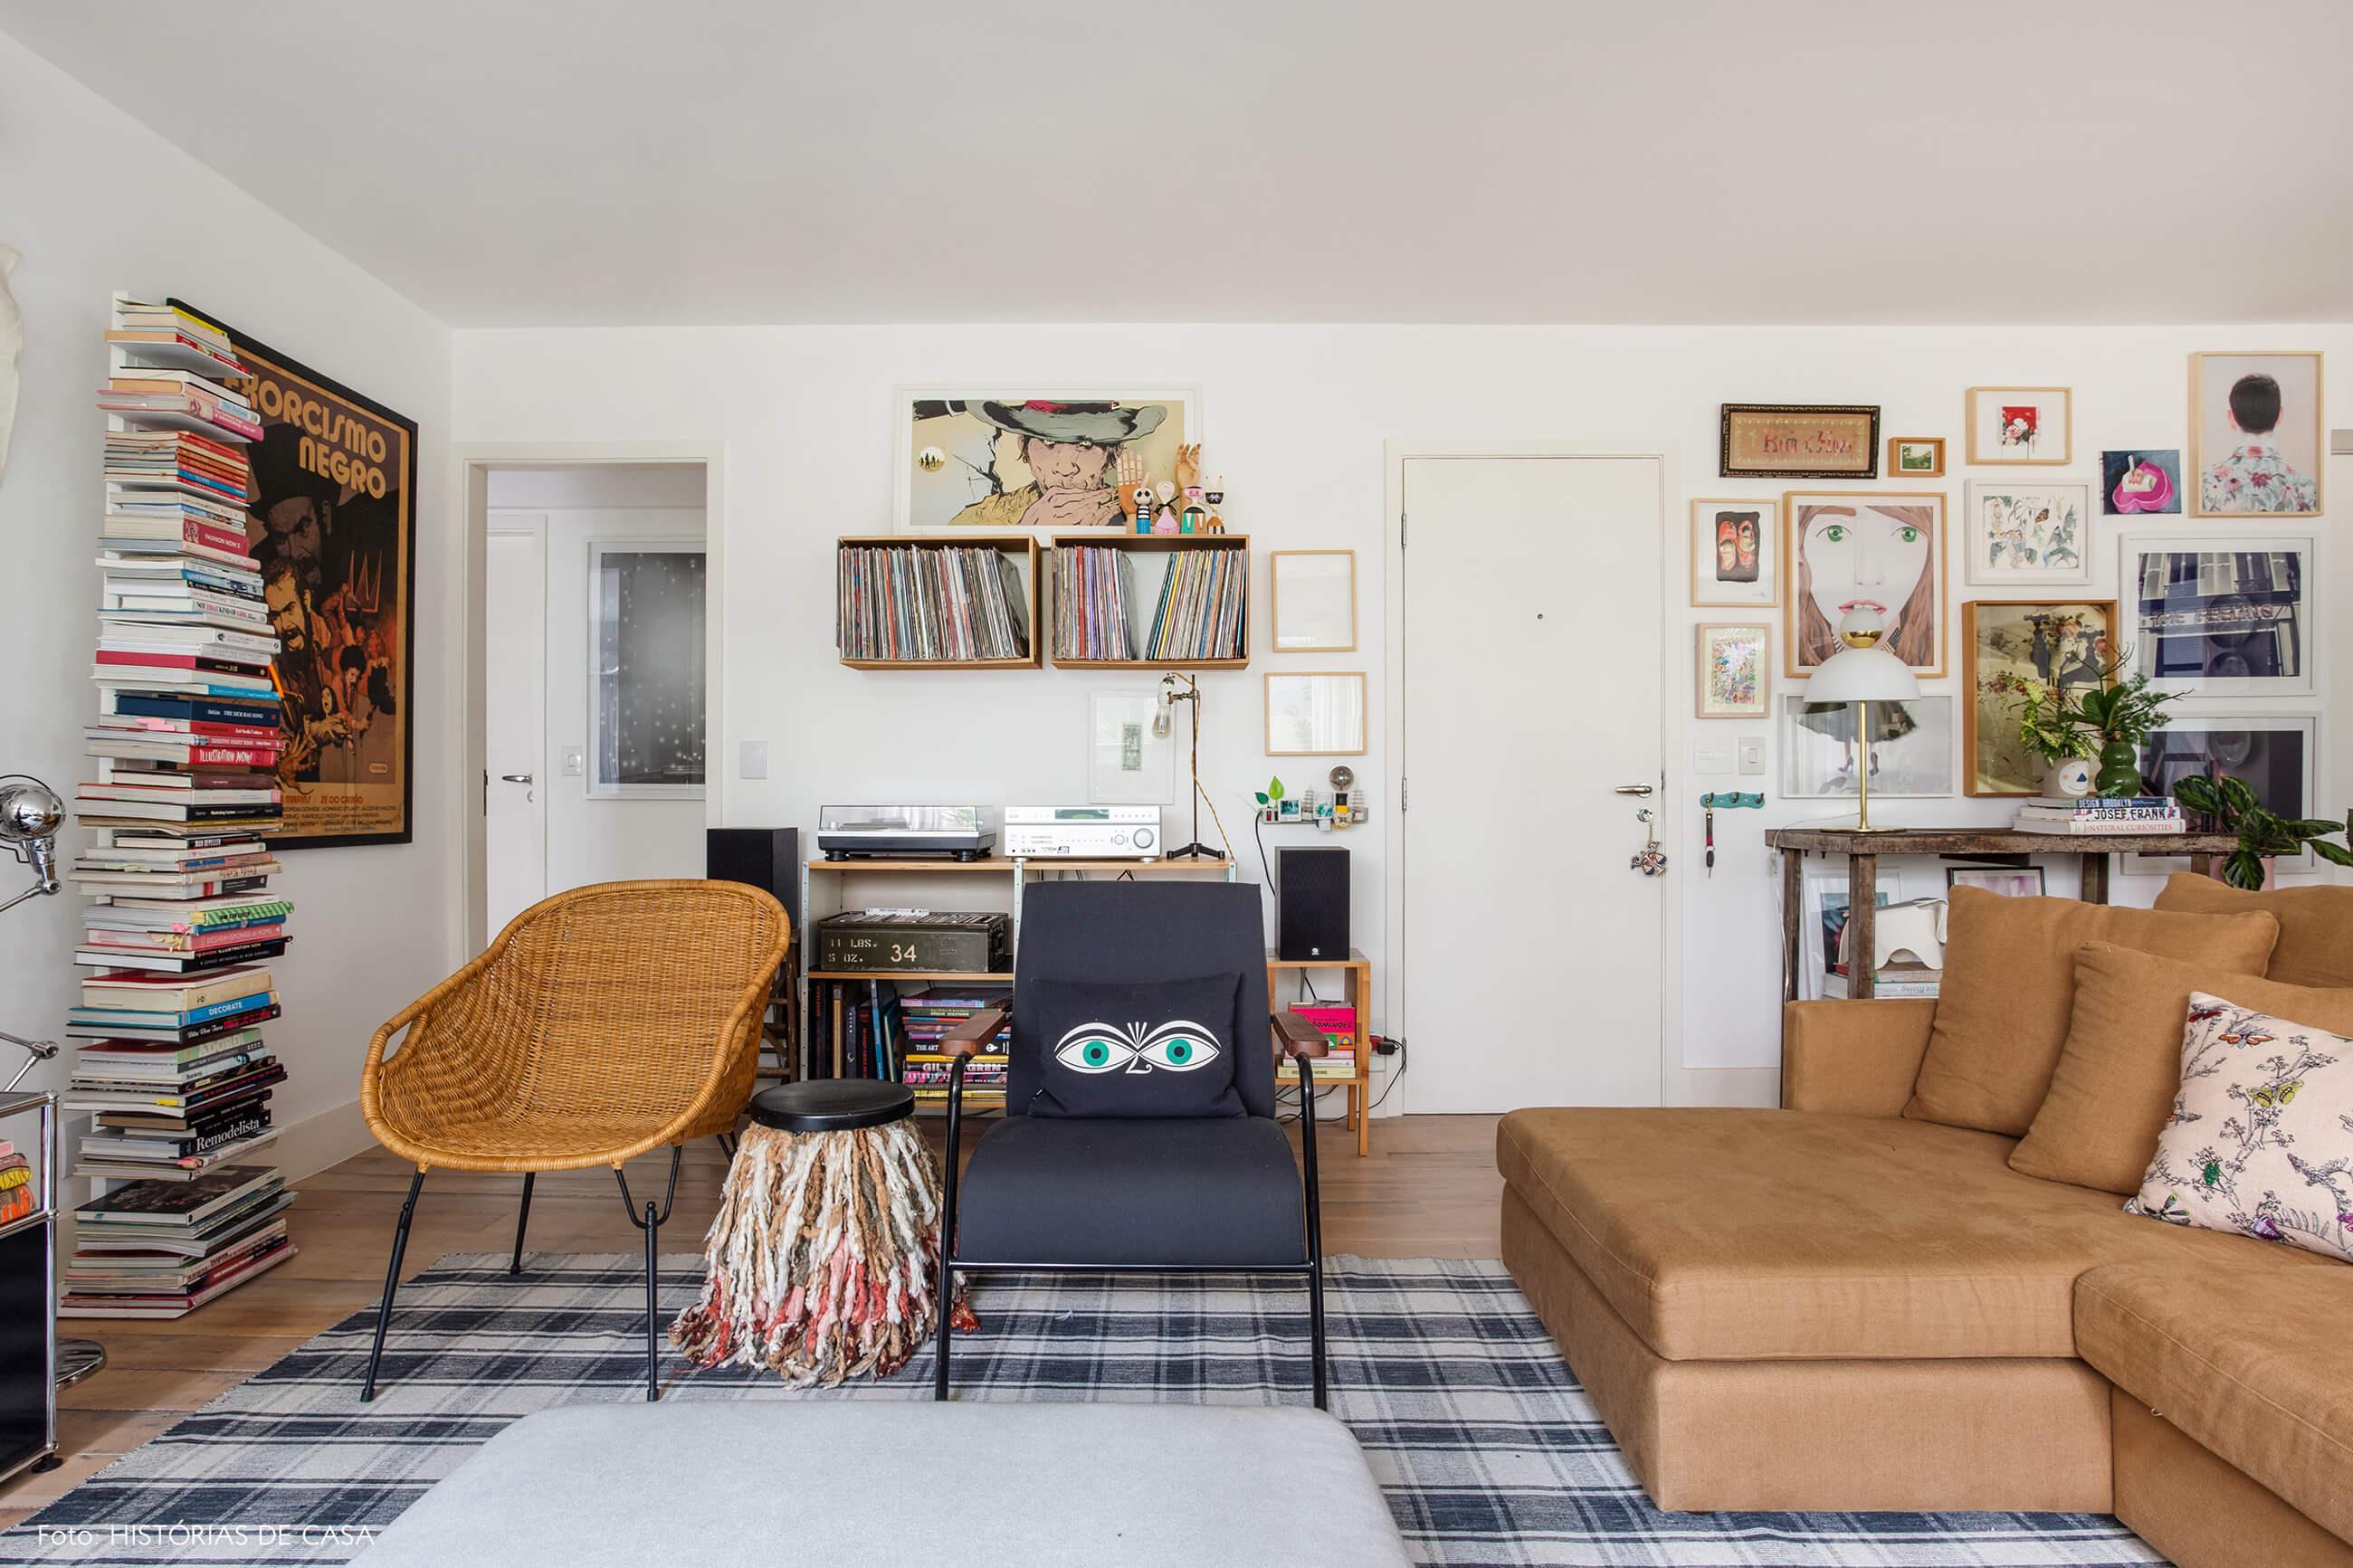 Sala com poltrona de vime e tapete preto e branco